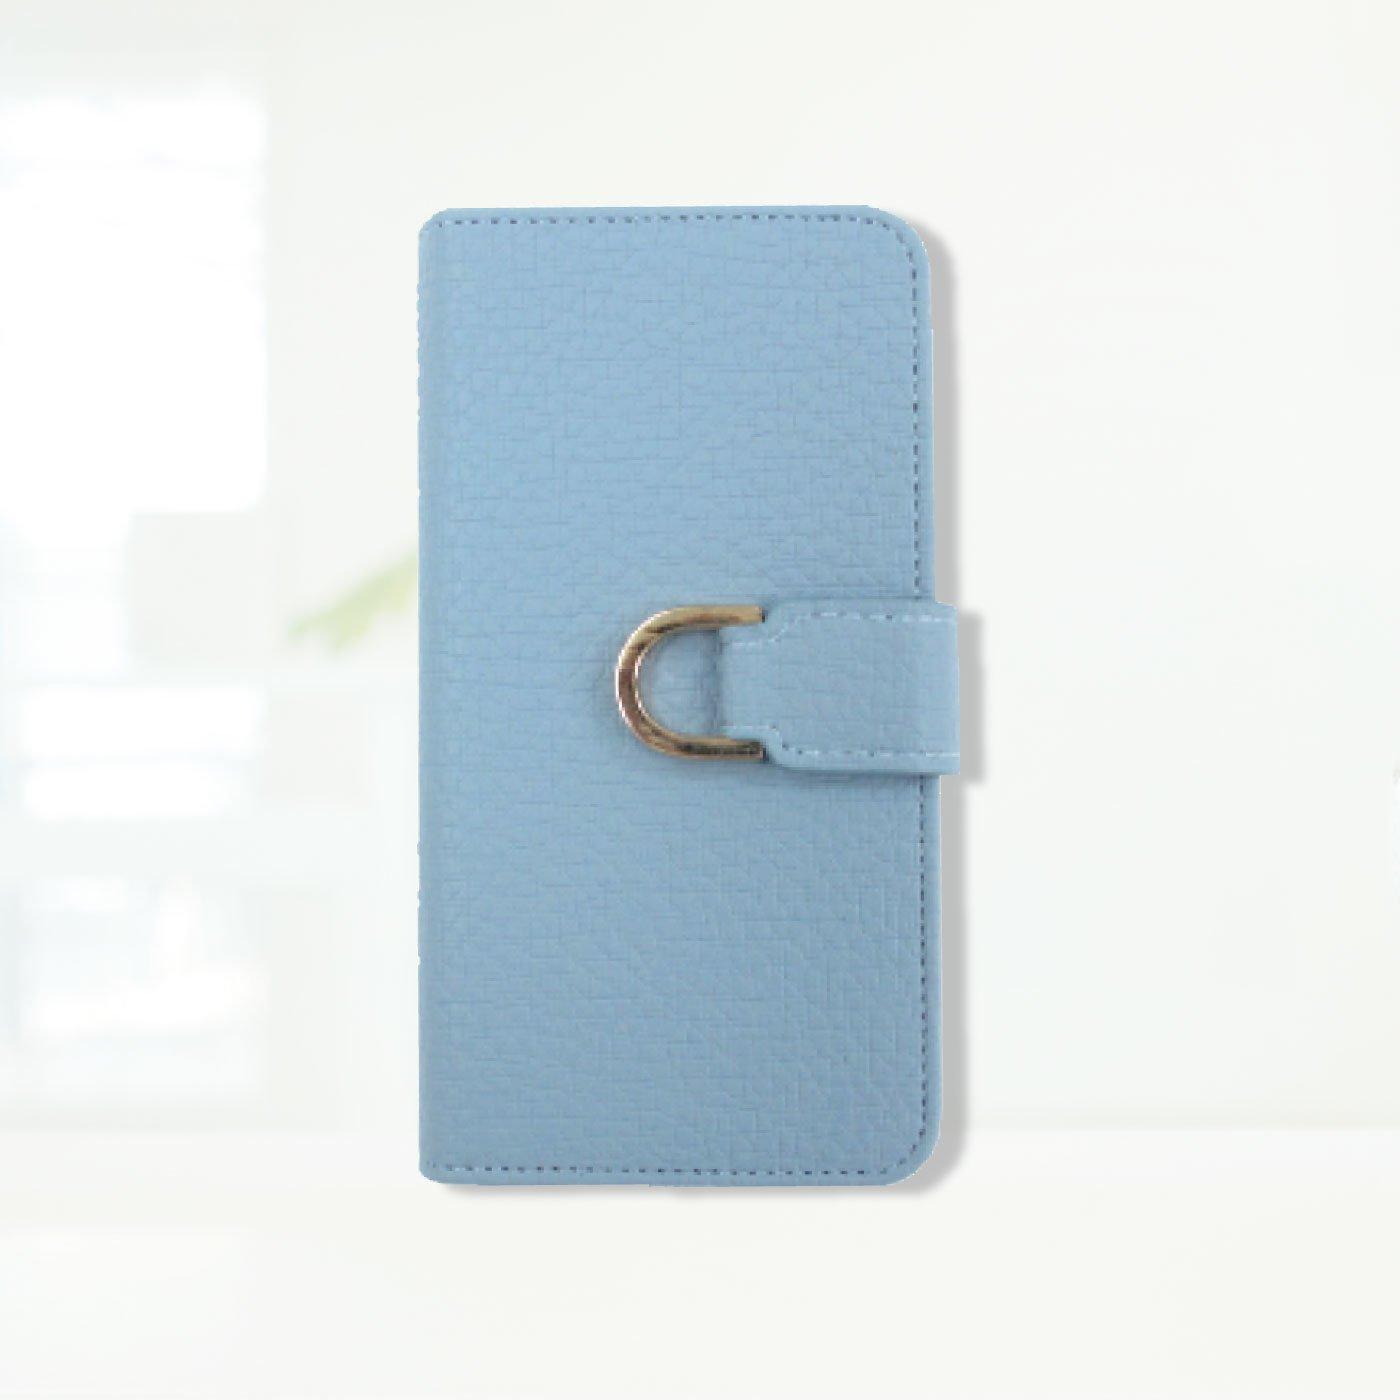 iphone6s/6/7/8 手帳型スマホカバー メタルD